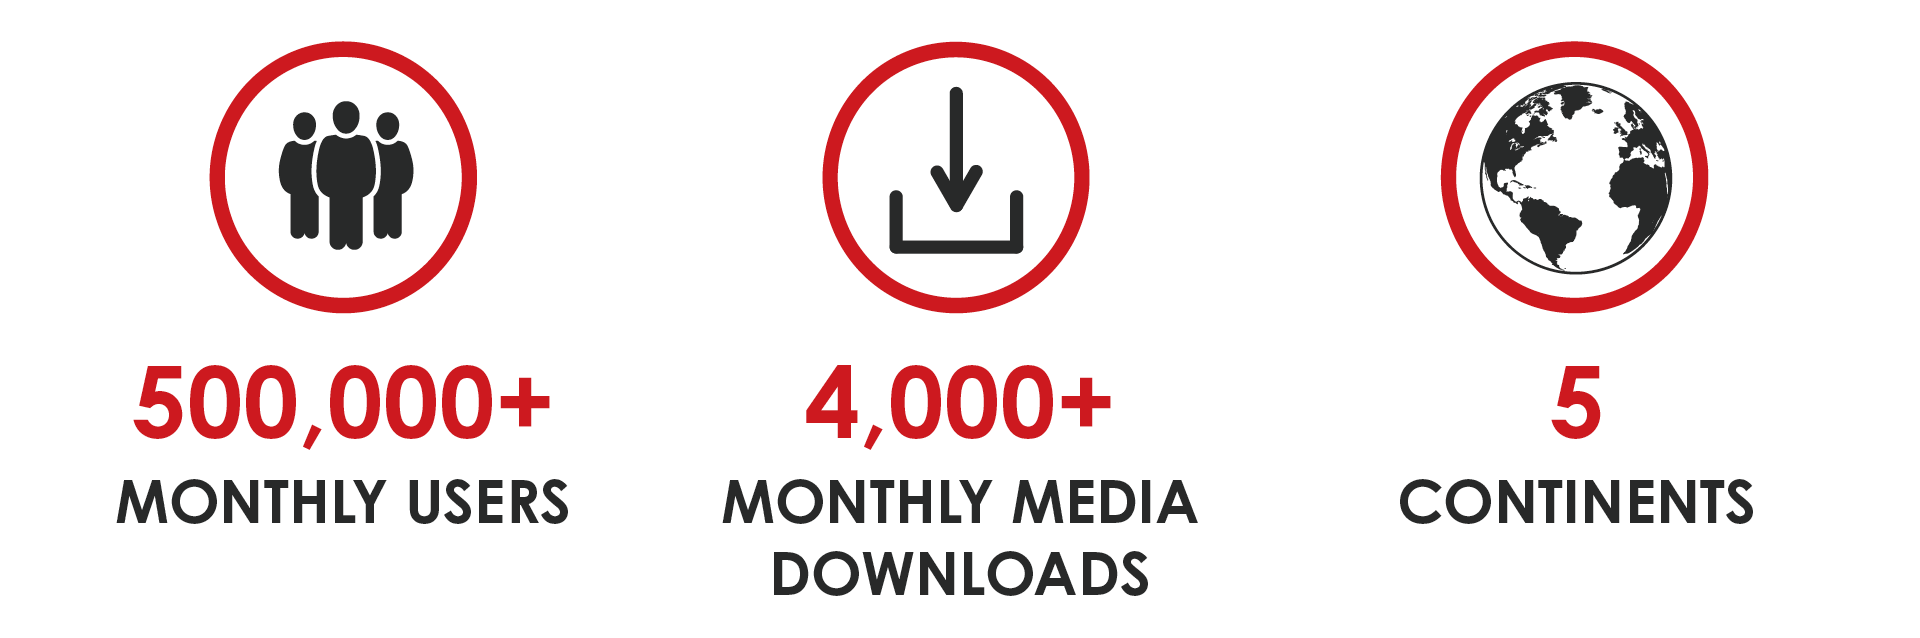 TheNewsMarket user statistics